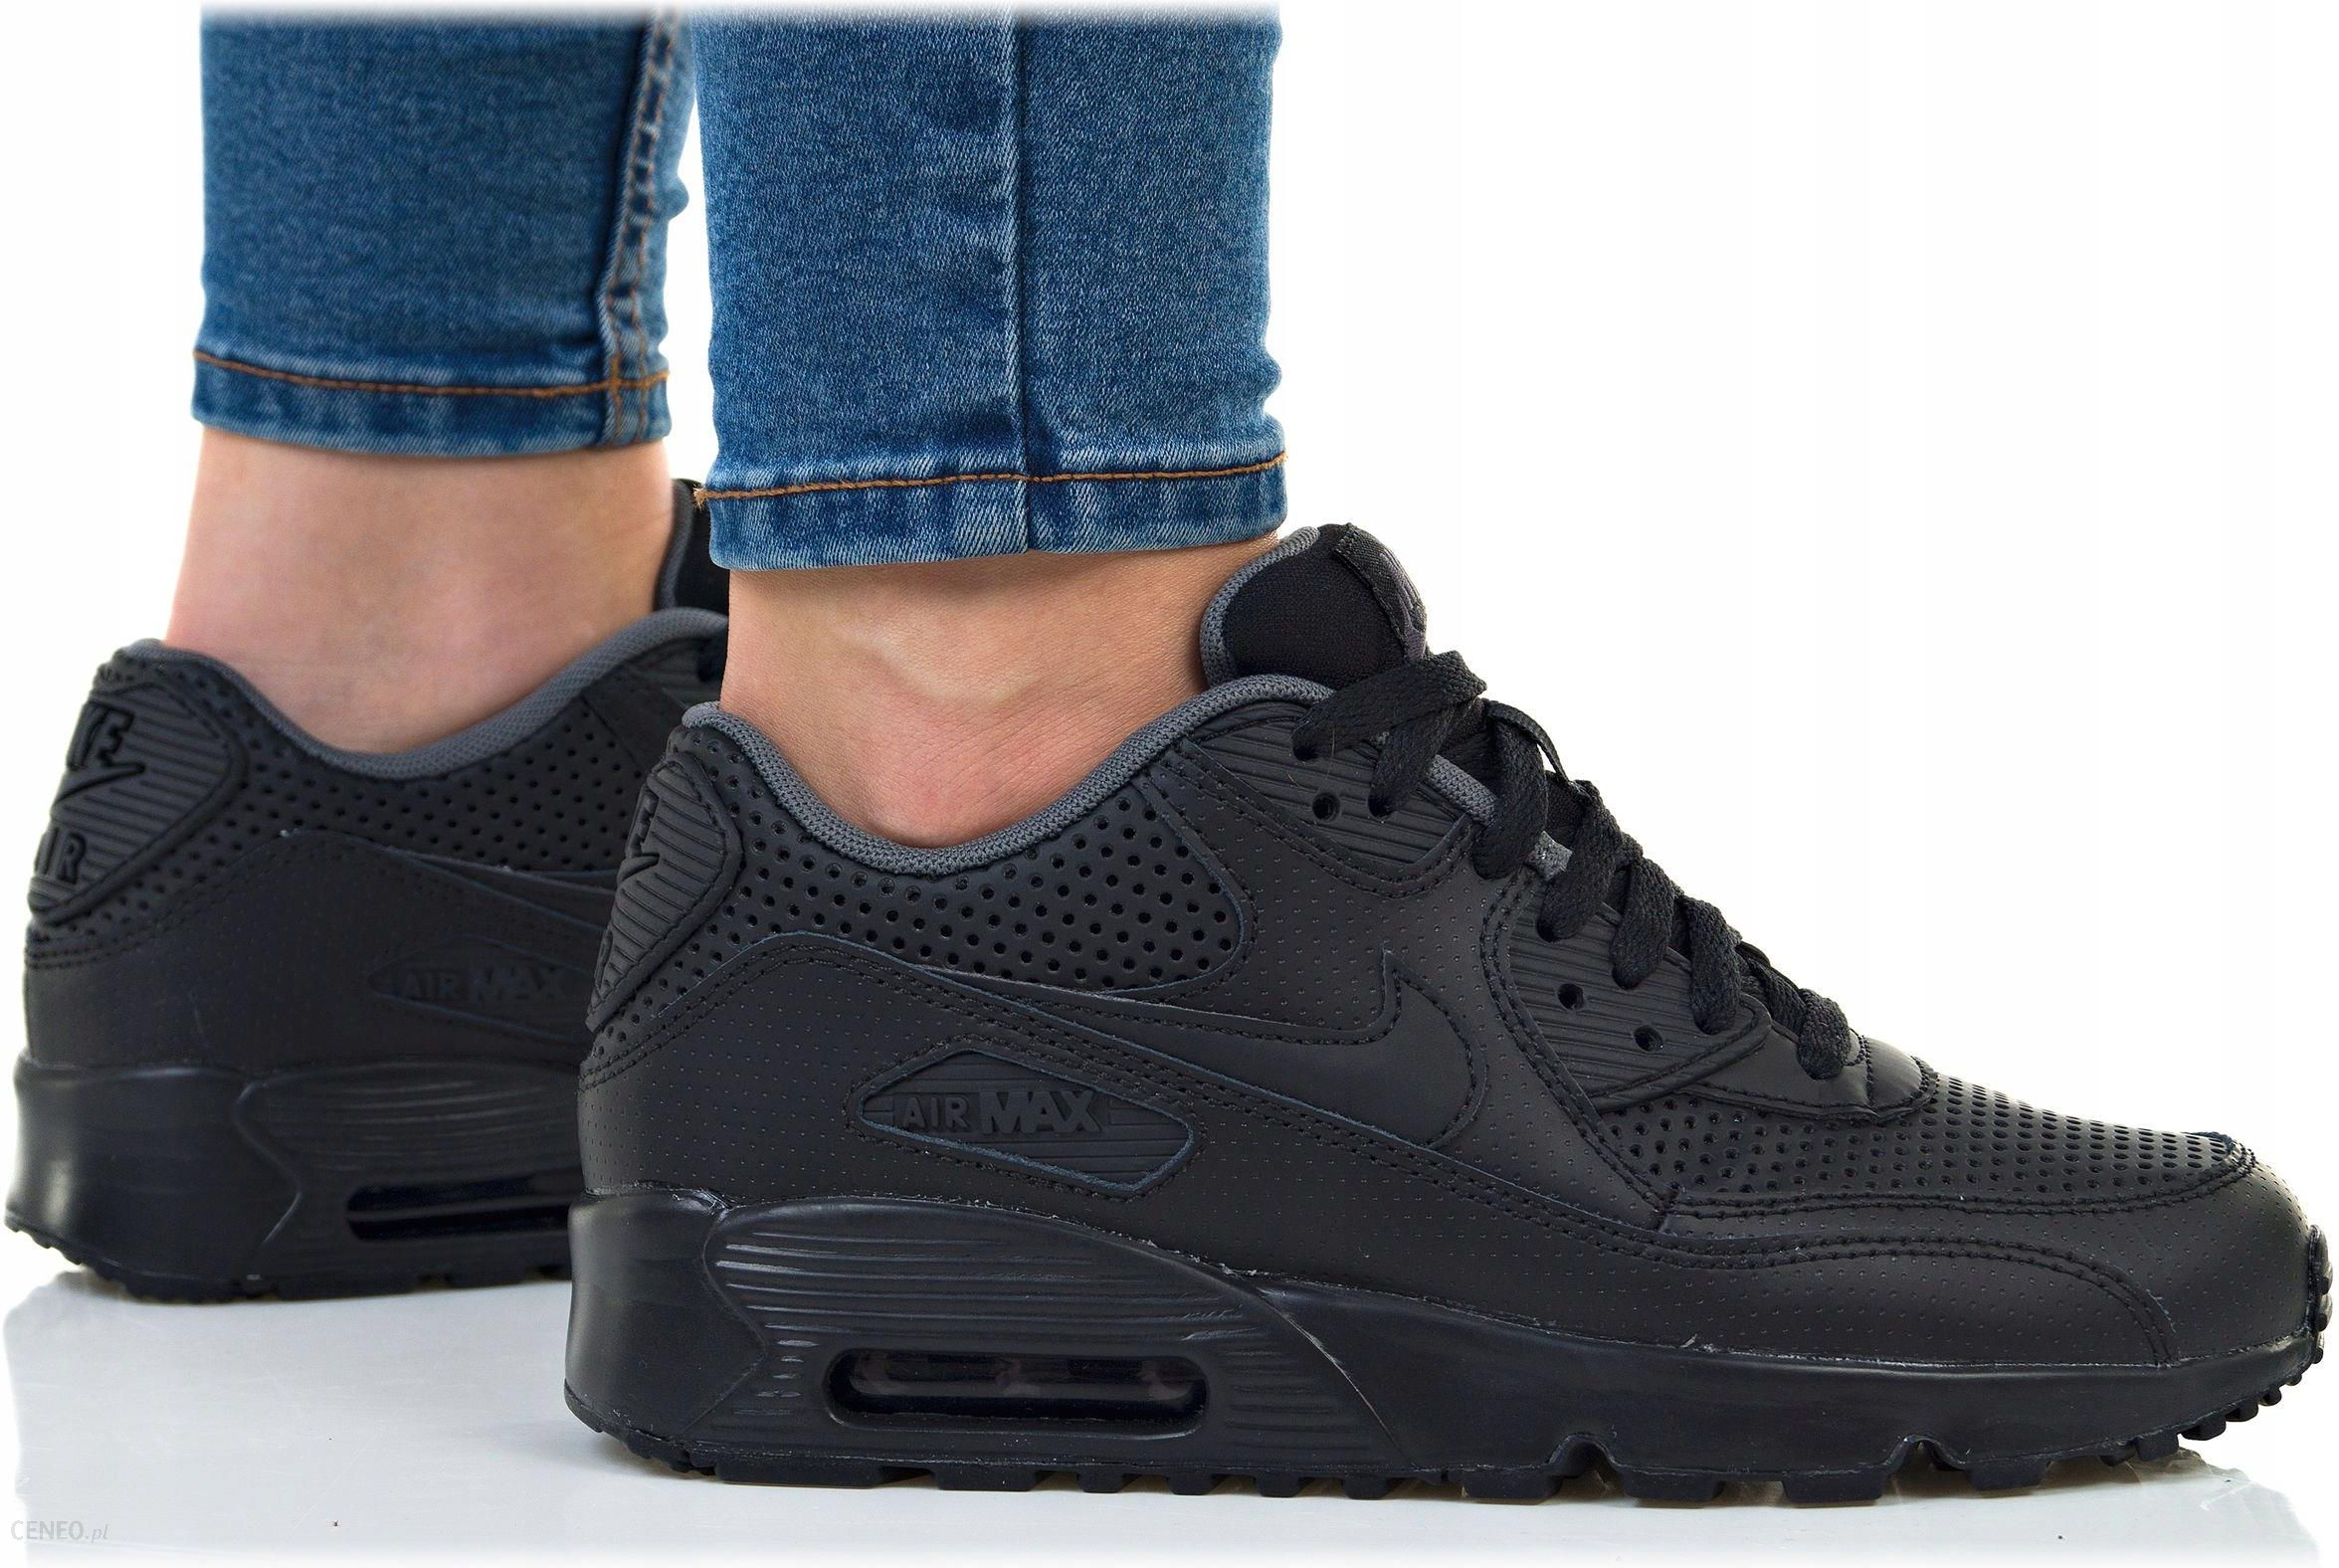 abe6ebcf8706 Buty Nike Damskie Air Max 90 Se Ltr 859560-003 - Ceny i opinie ...